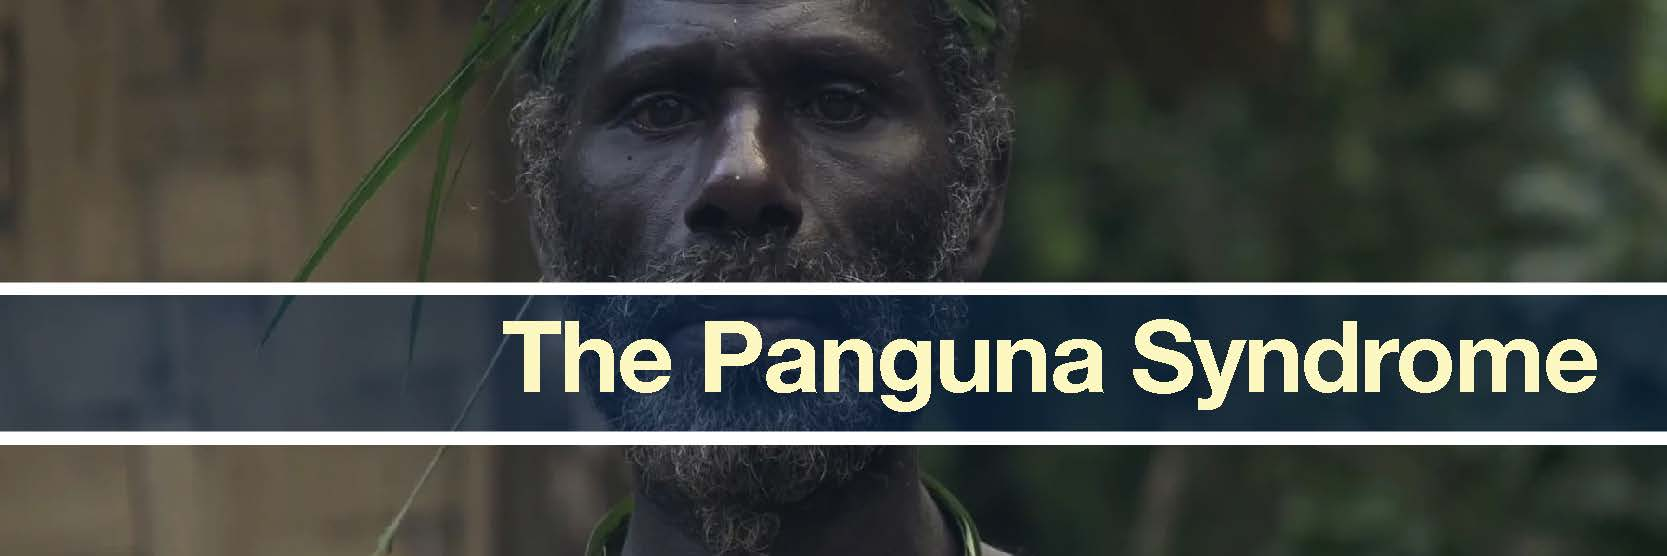 the panguna syndrome banner.jpg